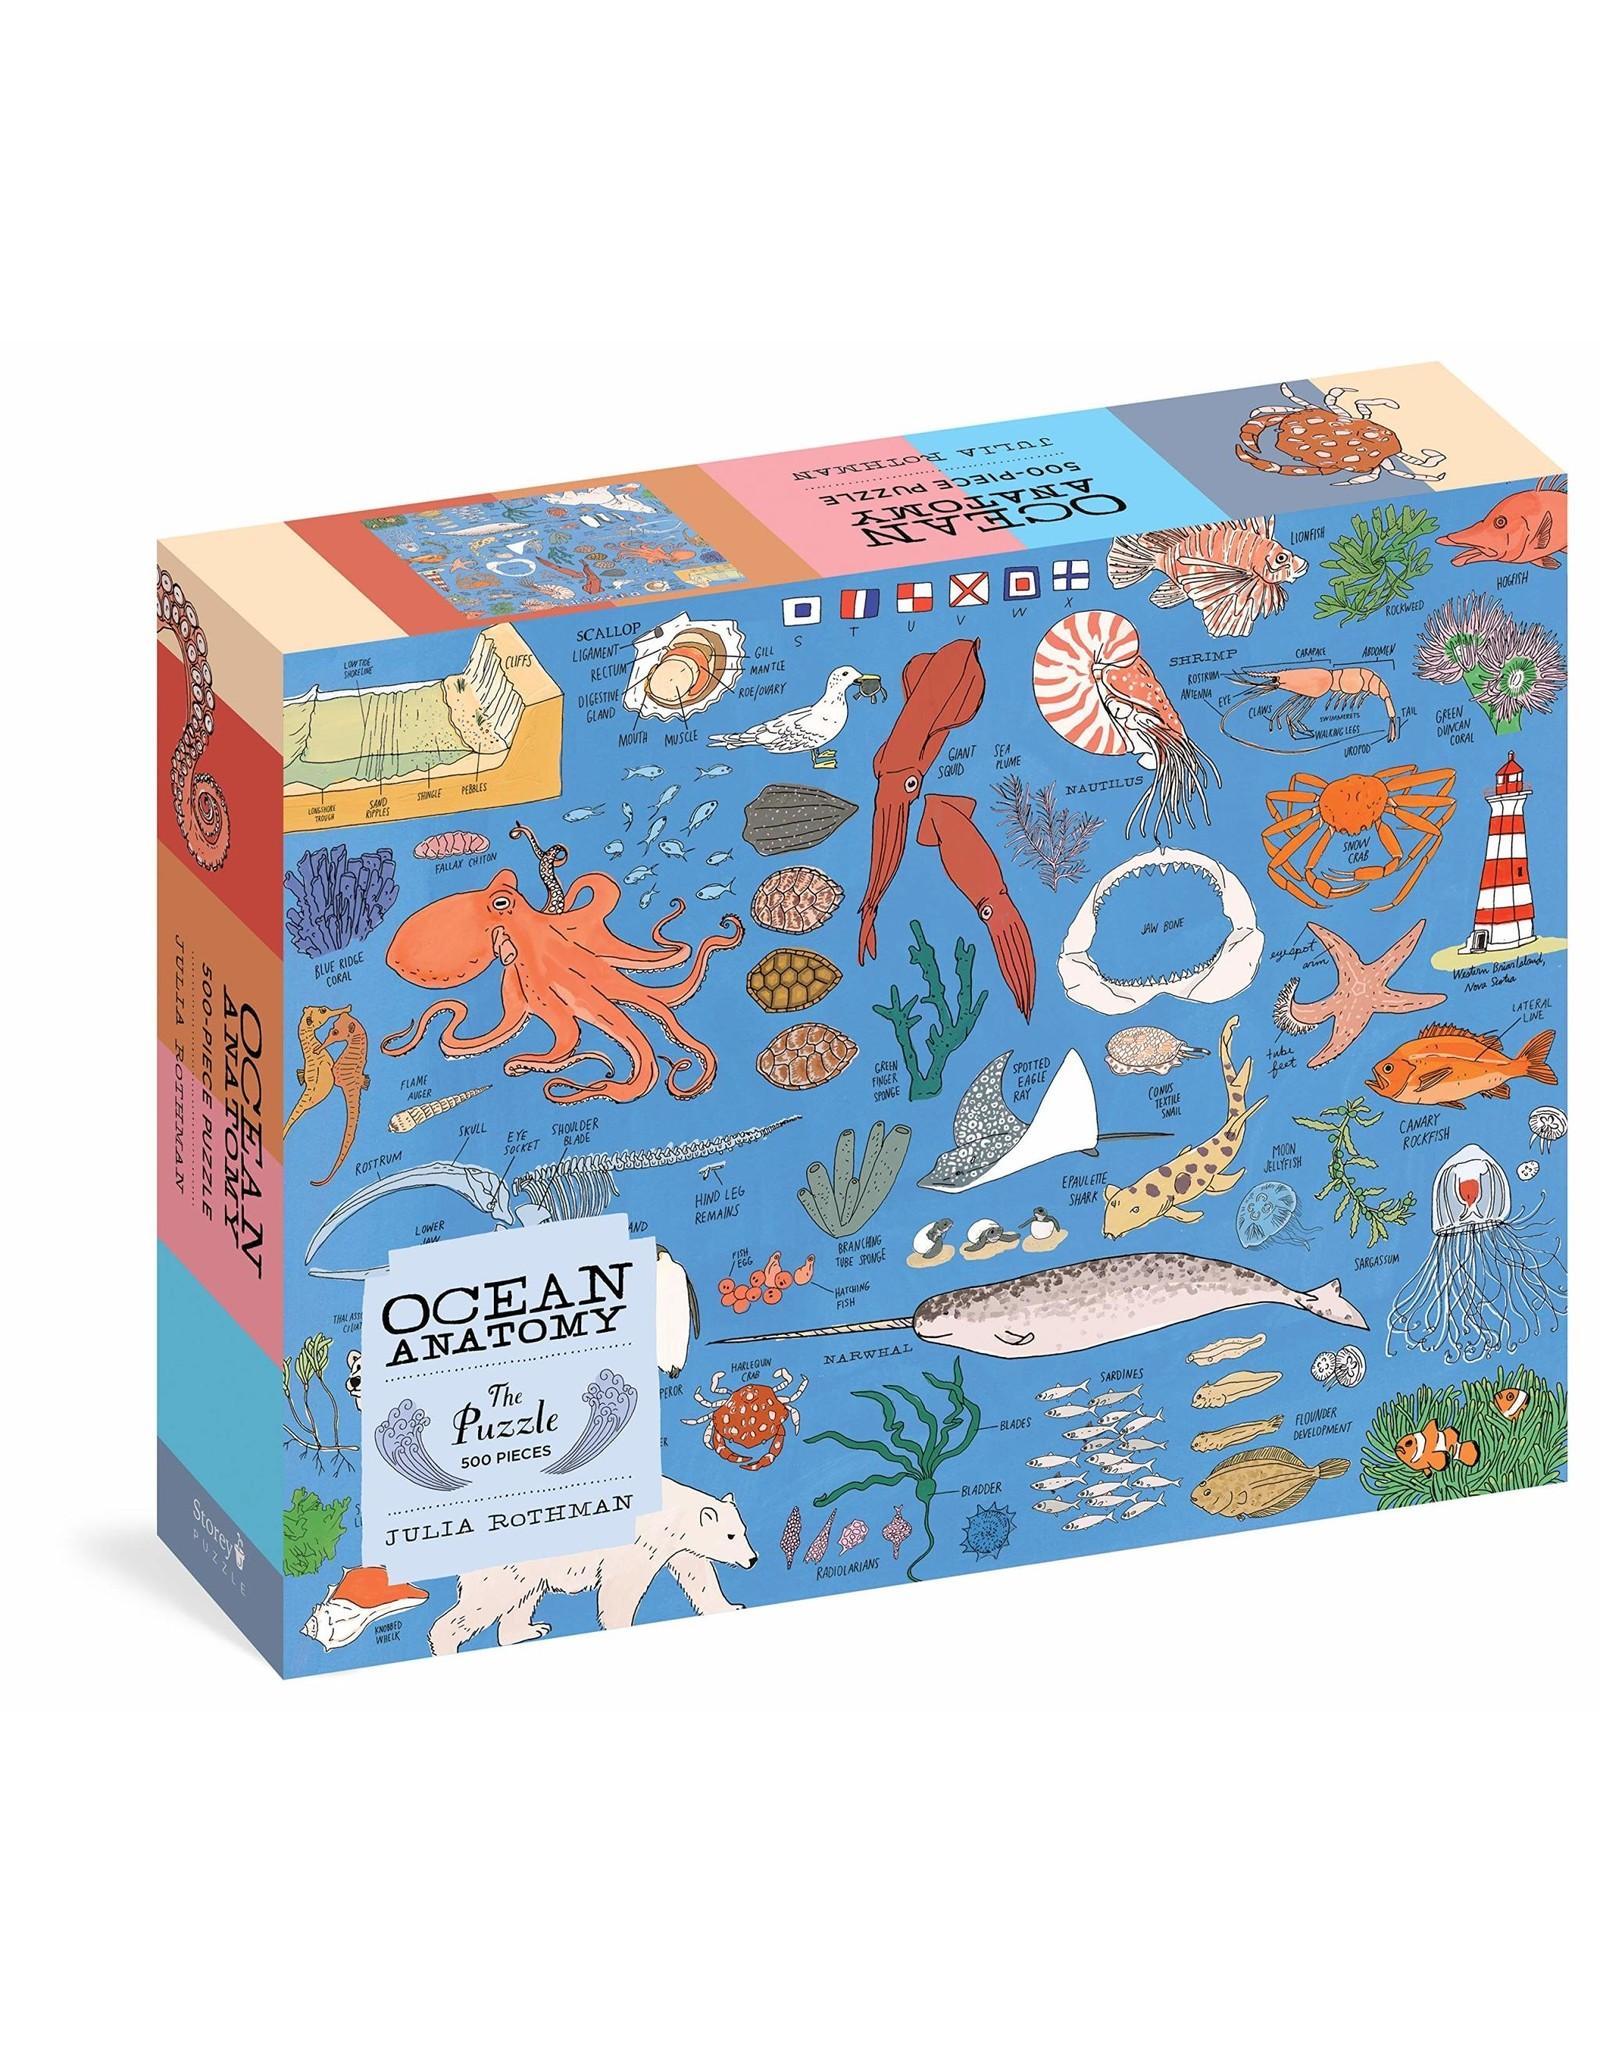 Ocean Anatomy 500 pc